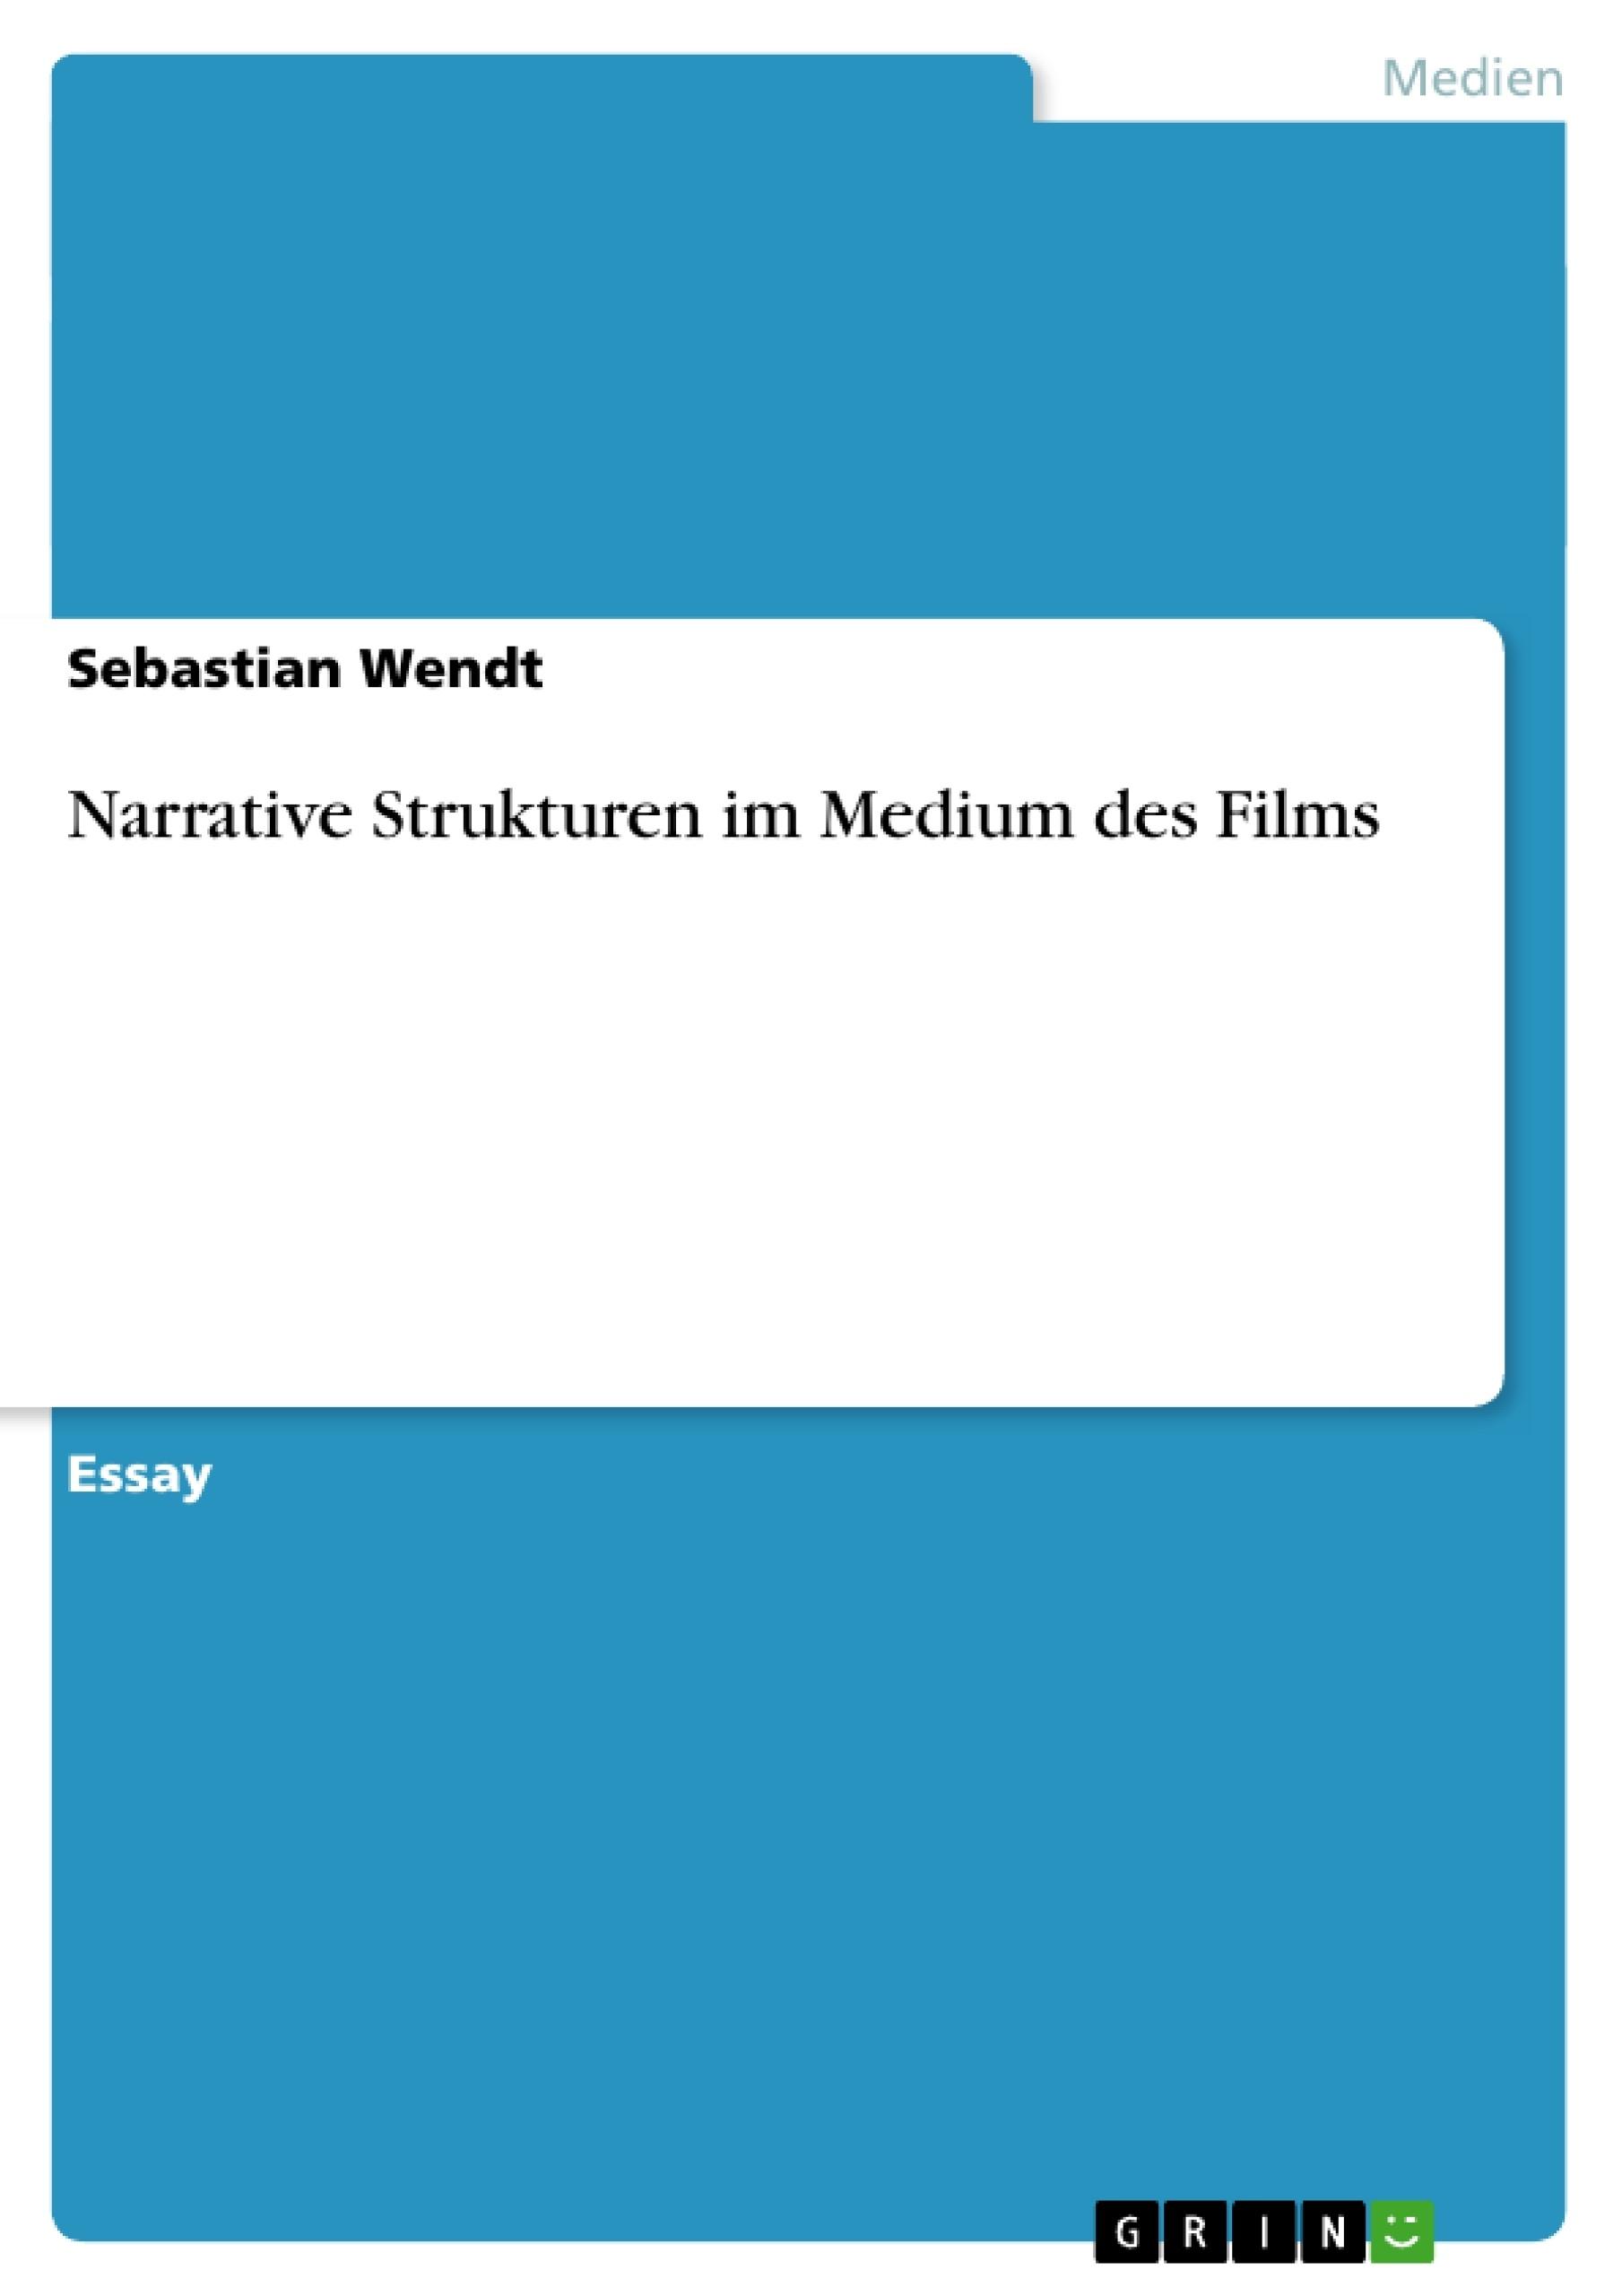 Titel: Narrative Strukturen im Medium des Films